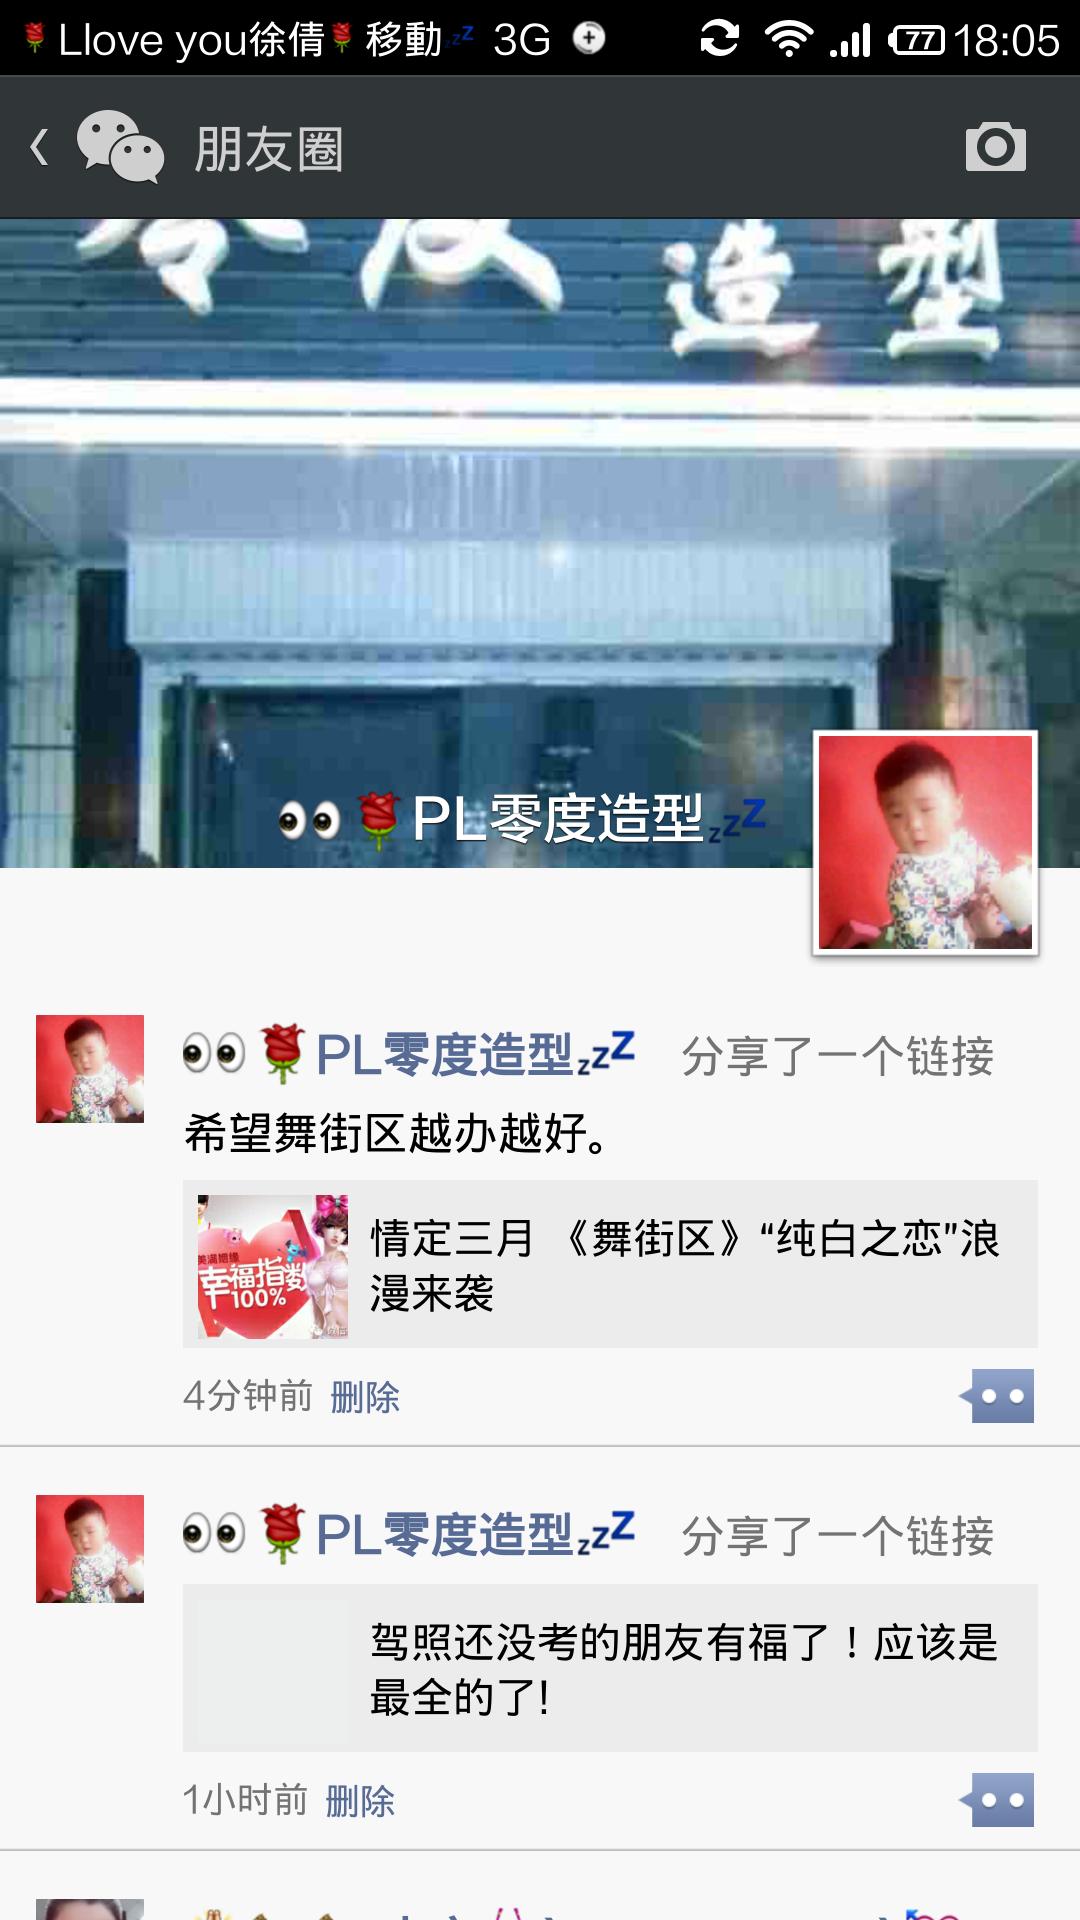 Screenshot_2014-03-01-18-05-13.png